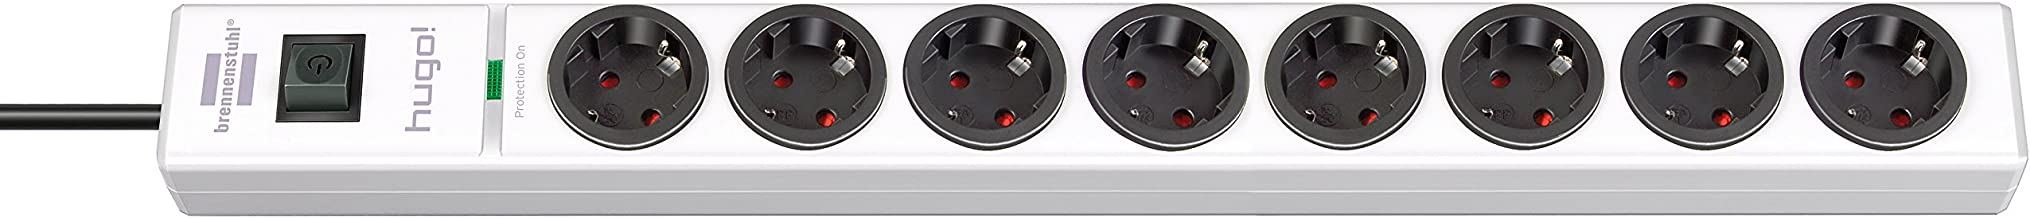 Brennenstuhl hugo! Stekkerdoos 8-voudig met overspanningsbeveiliging (2 m kabel en schakelaar, behuizing van onbreekbaar p...